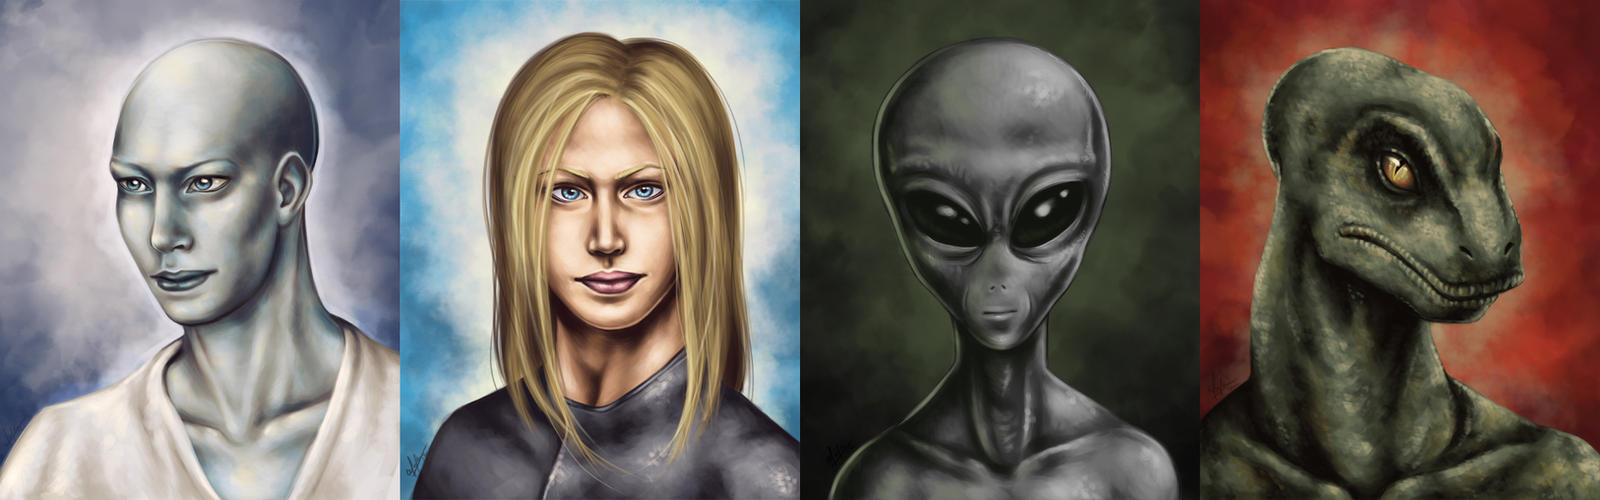 Extraterrestrial potraits by vervex